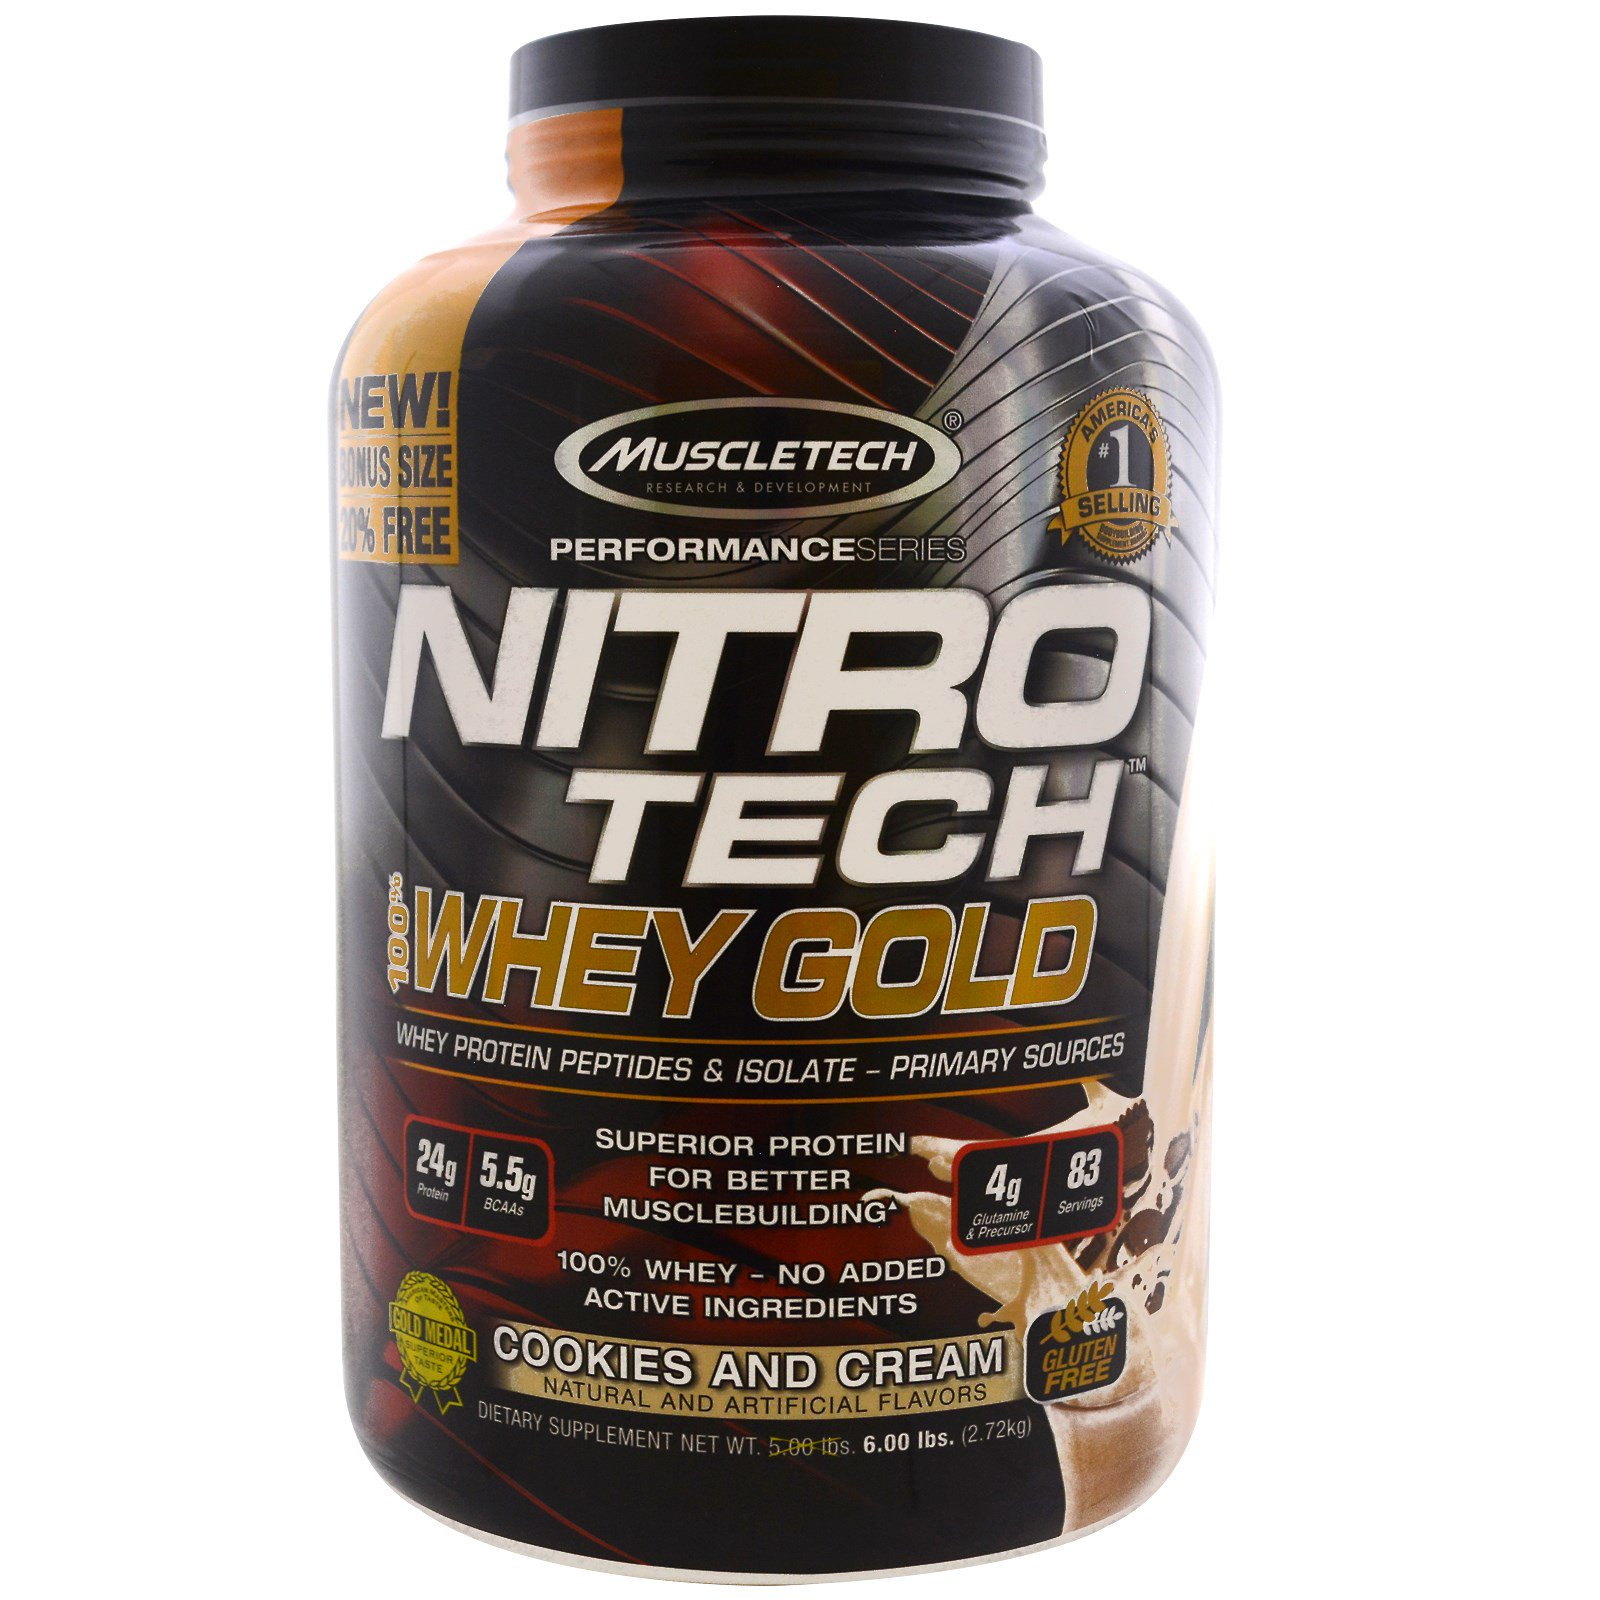 Muscletech, Nitro Tech 100% Золотая сыворотка, Печенье и сливки, 5,53 фунта (2,51 кг)